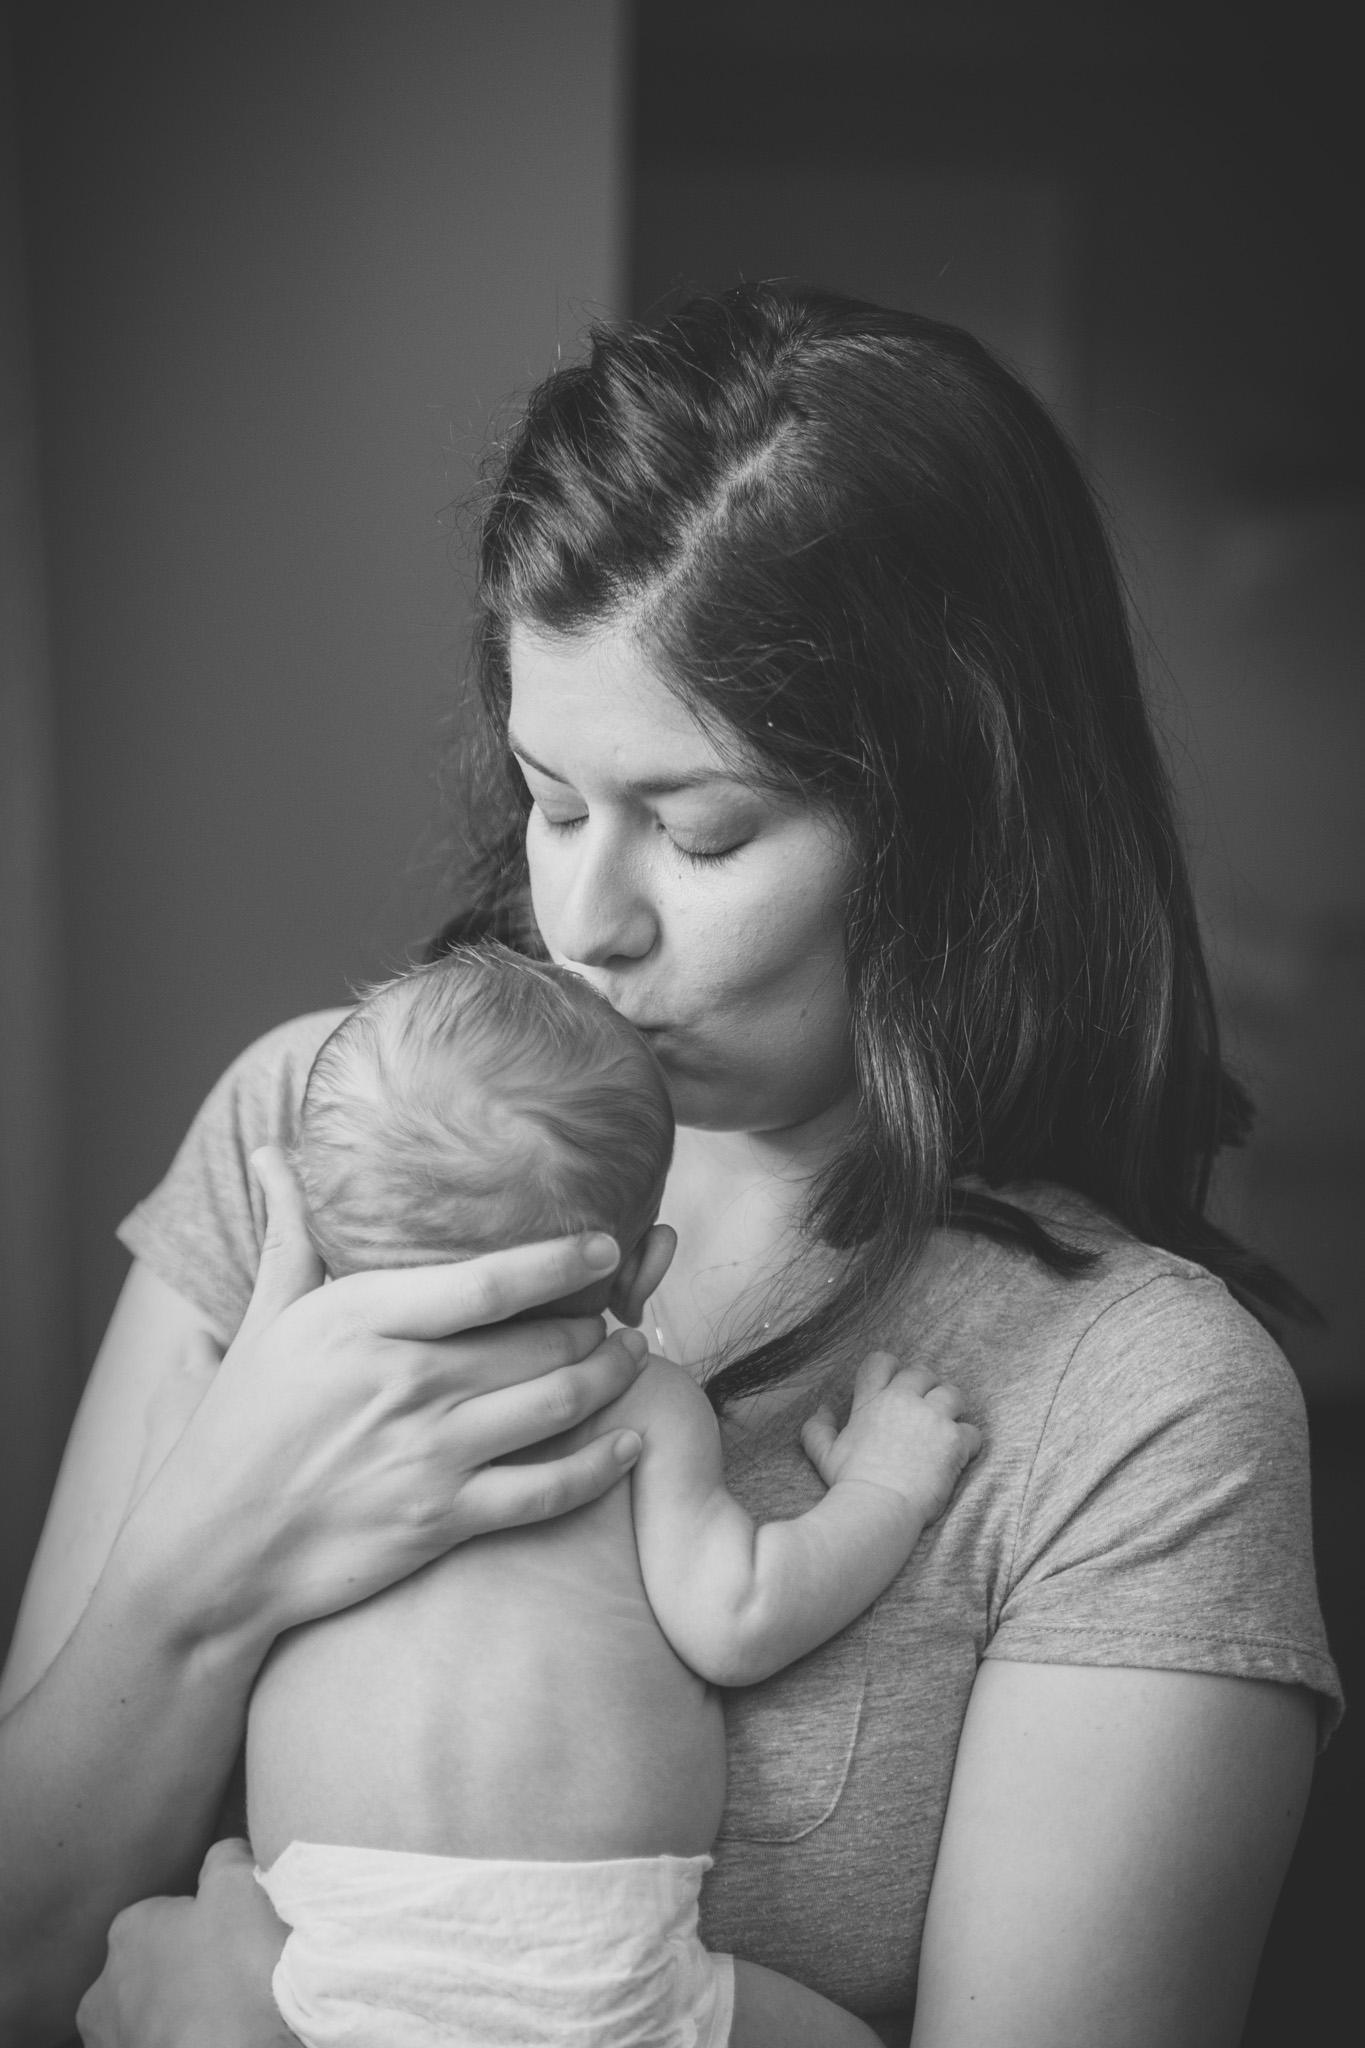 lifestyle_session_newborn_family_home_lynhcburg_va_photographers015.jpg